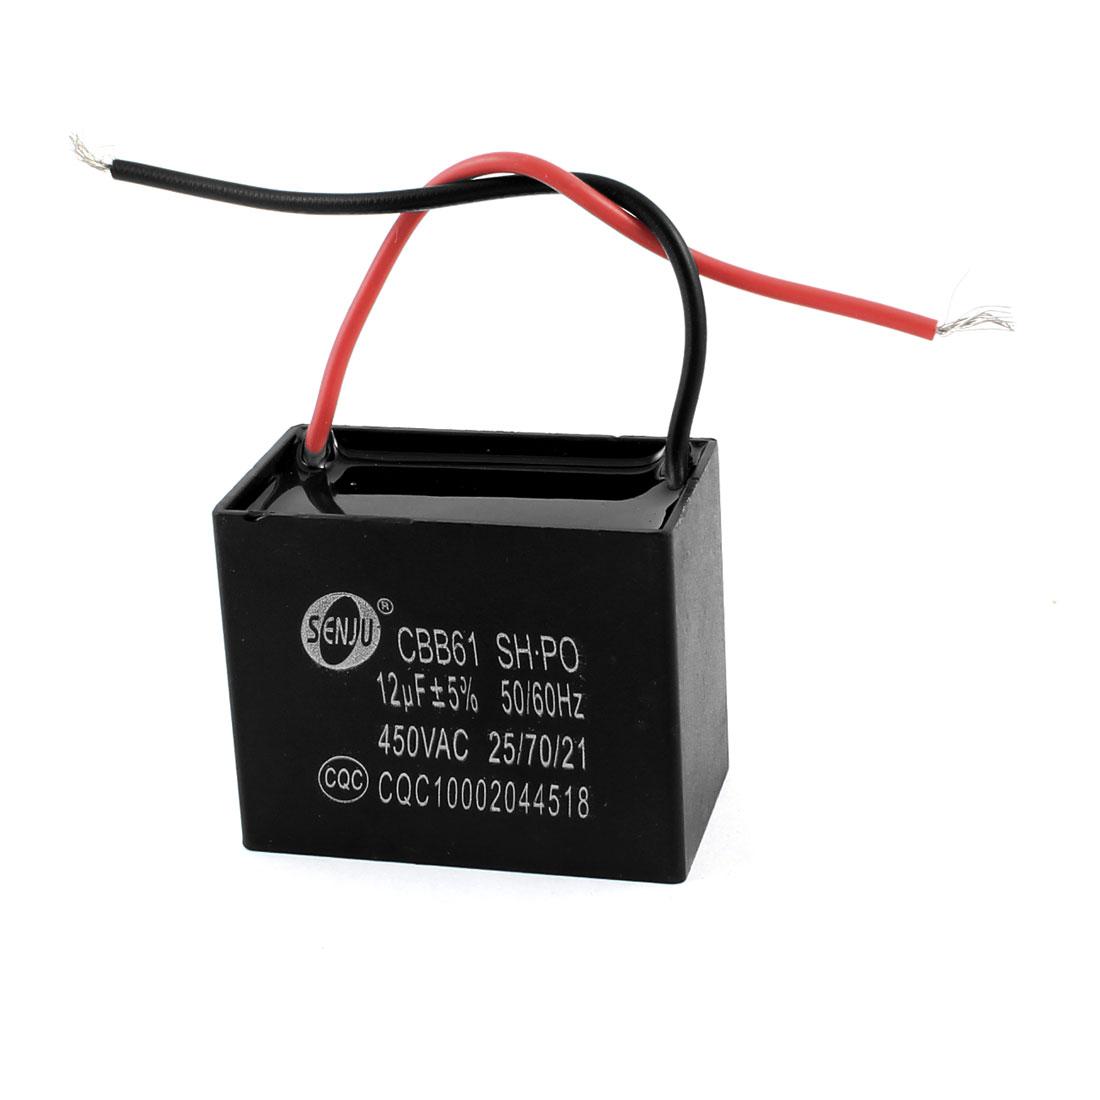 Fan CBB61 12uF 56/60Hz 450VAC 2 Wire Polypropylene Film Motor Run Capacitor